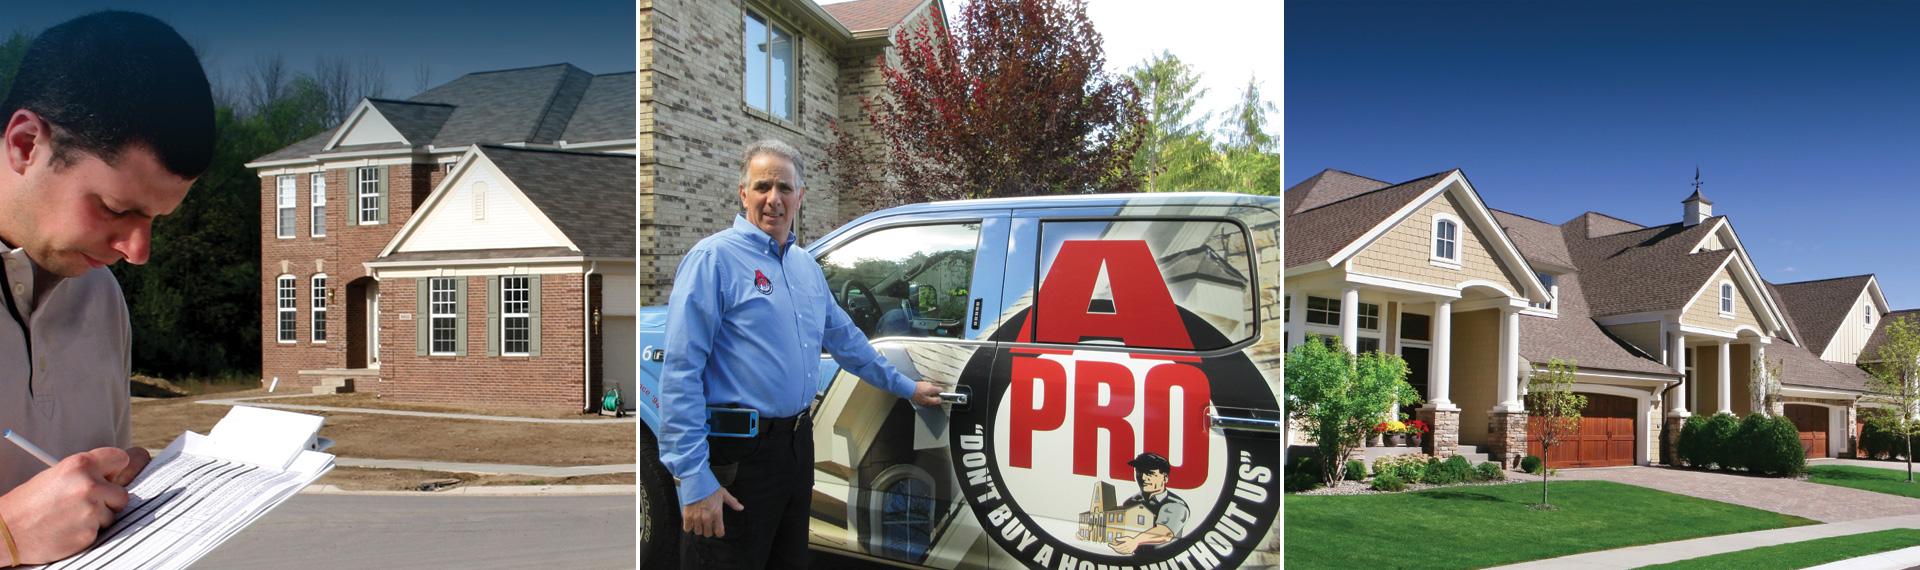 A-Pro Southwest Ohio Home Inspection Mason OH